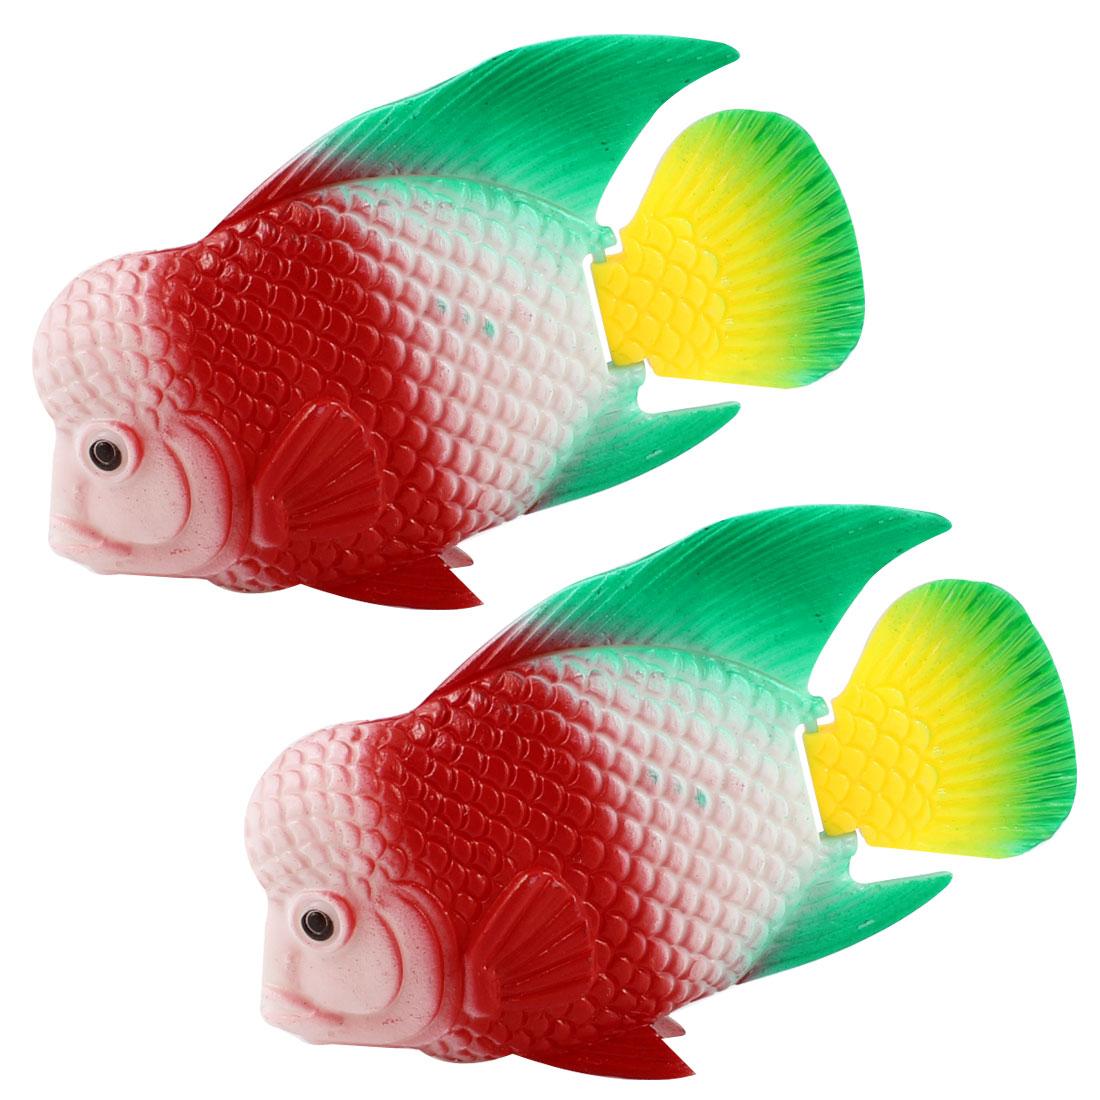 2 Pcs Manmade Tropical Red Plastic Fishes Aquarium Fish Tank Decoration Ornament